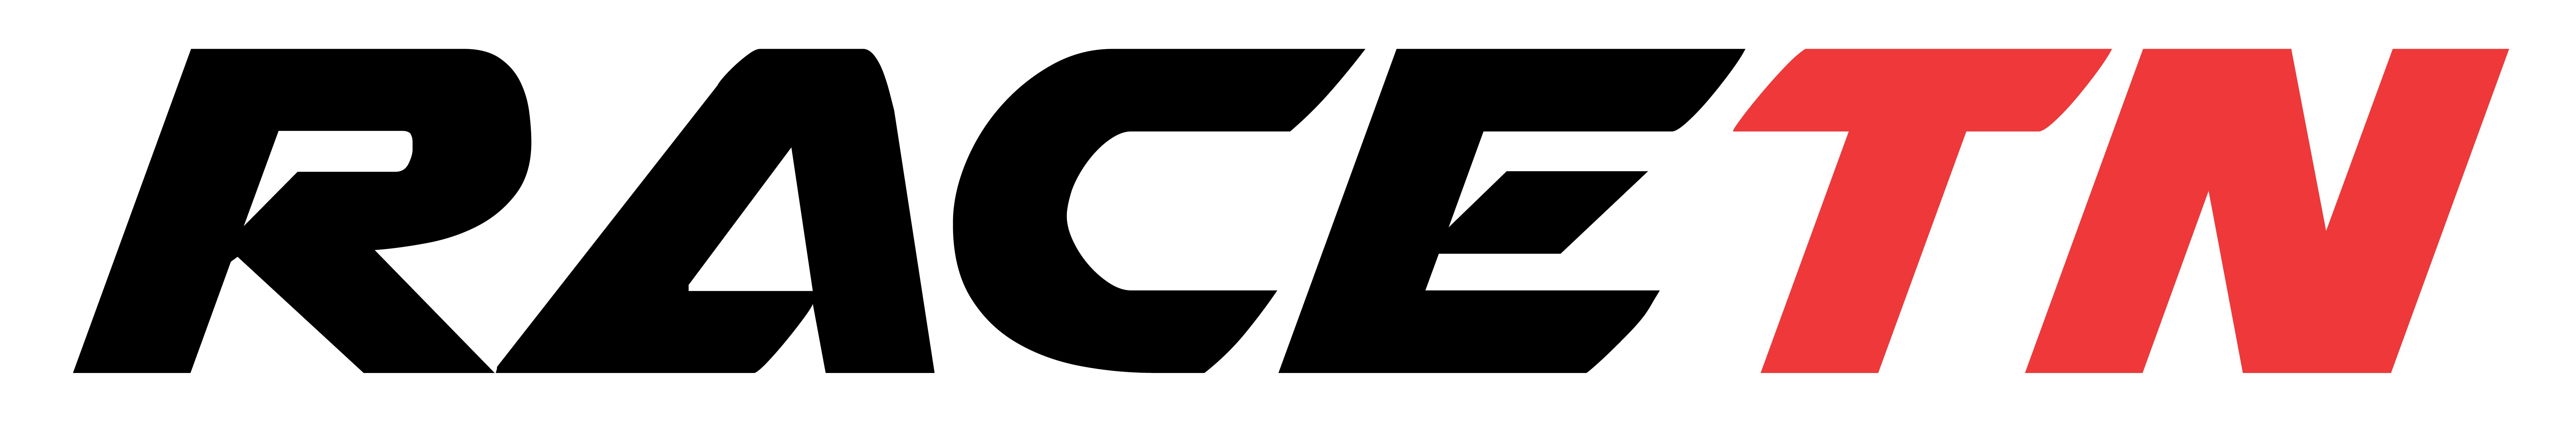 100 Motocross Racing Logo Bud Racing Products